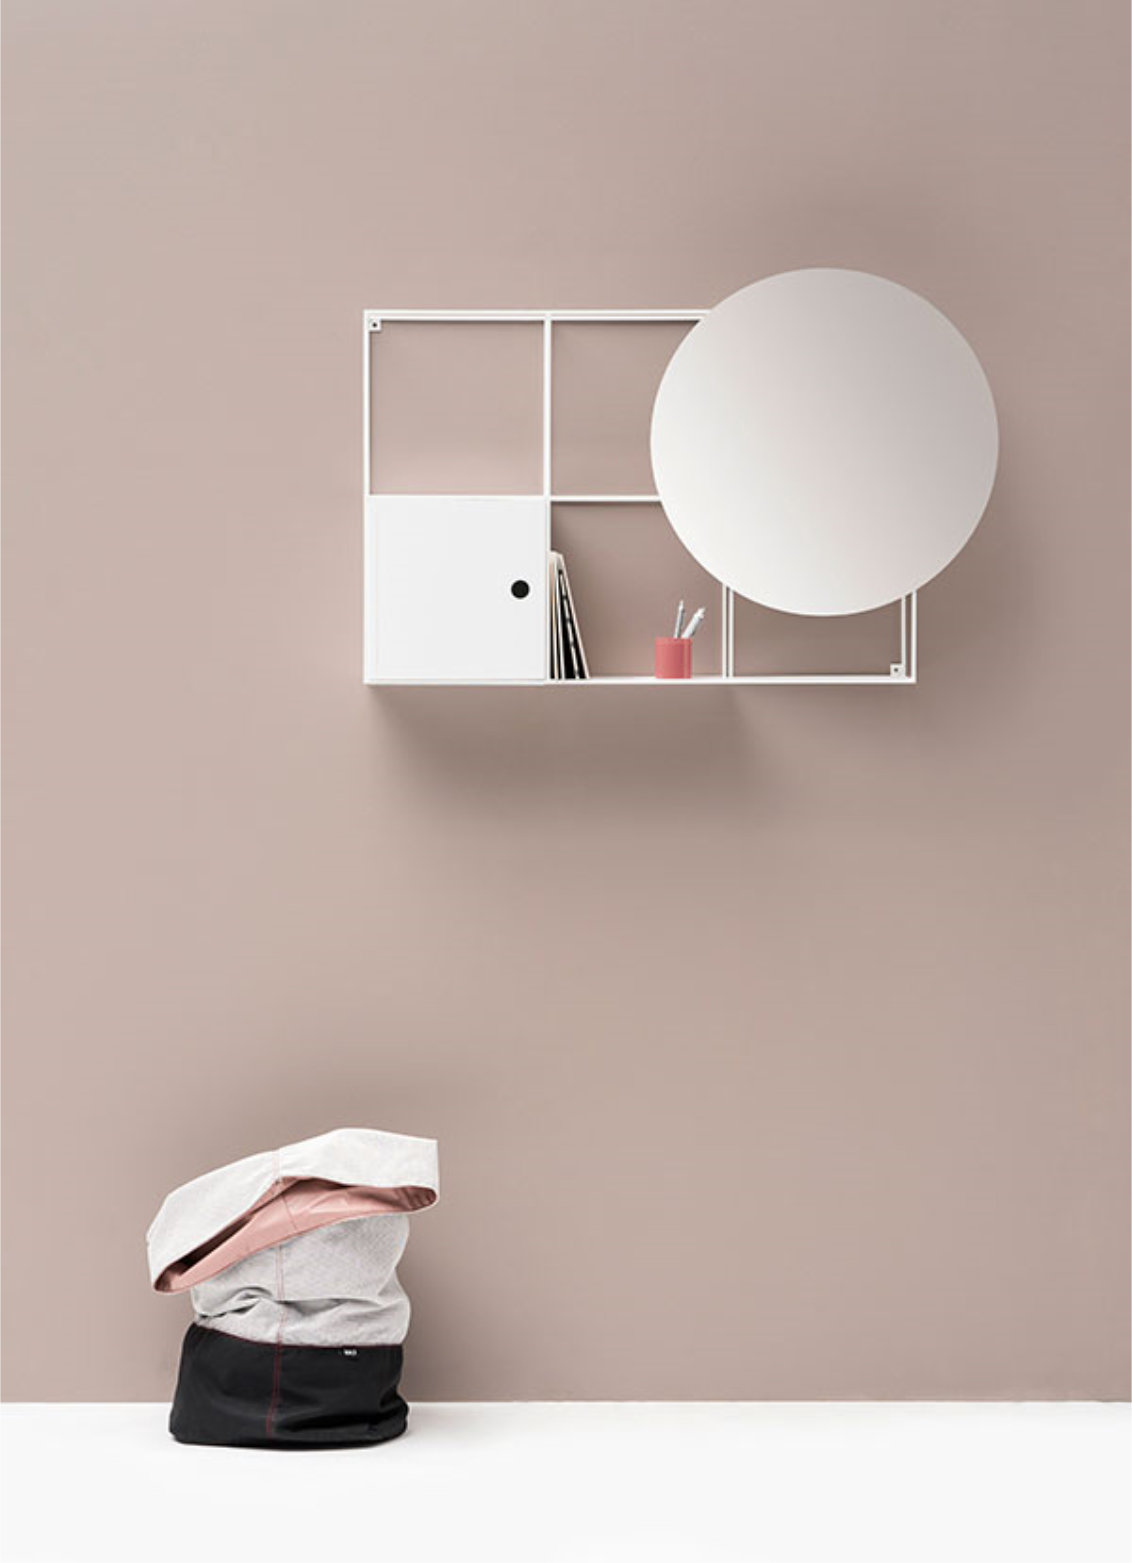 interiorlines_felt_white_norm_architects_2_1.jpg